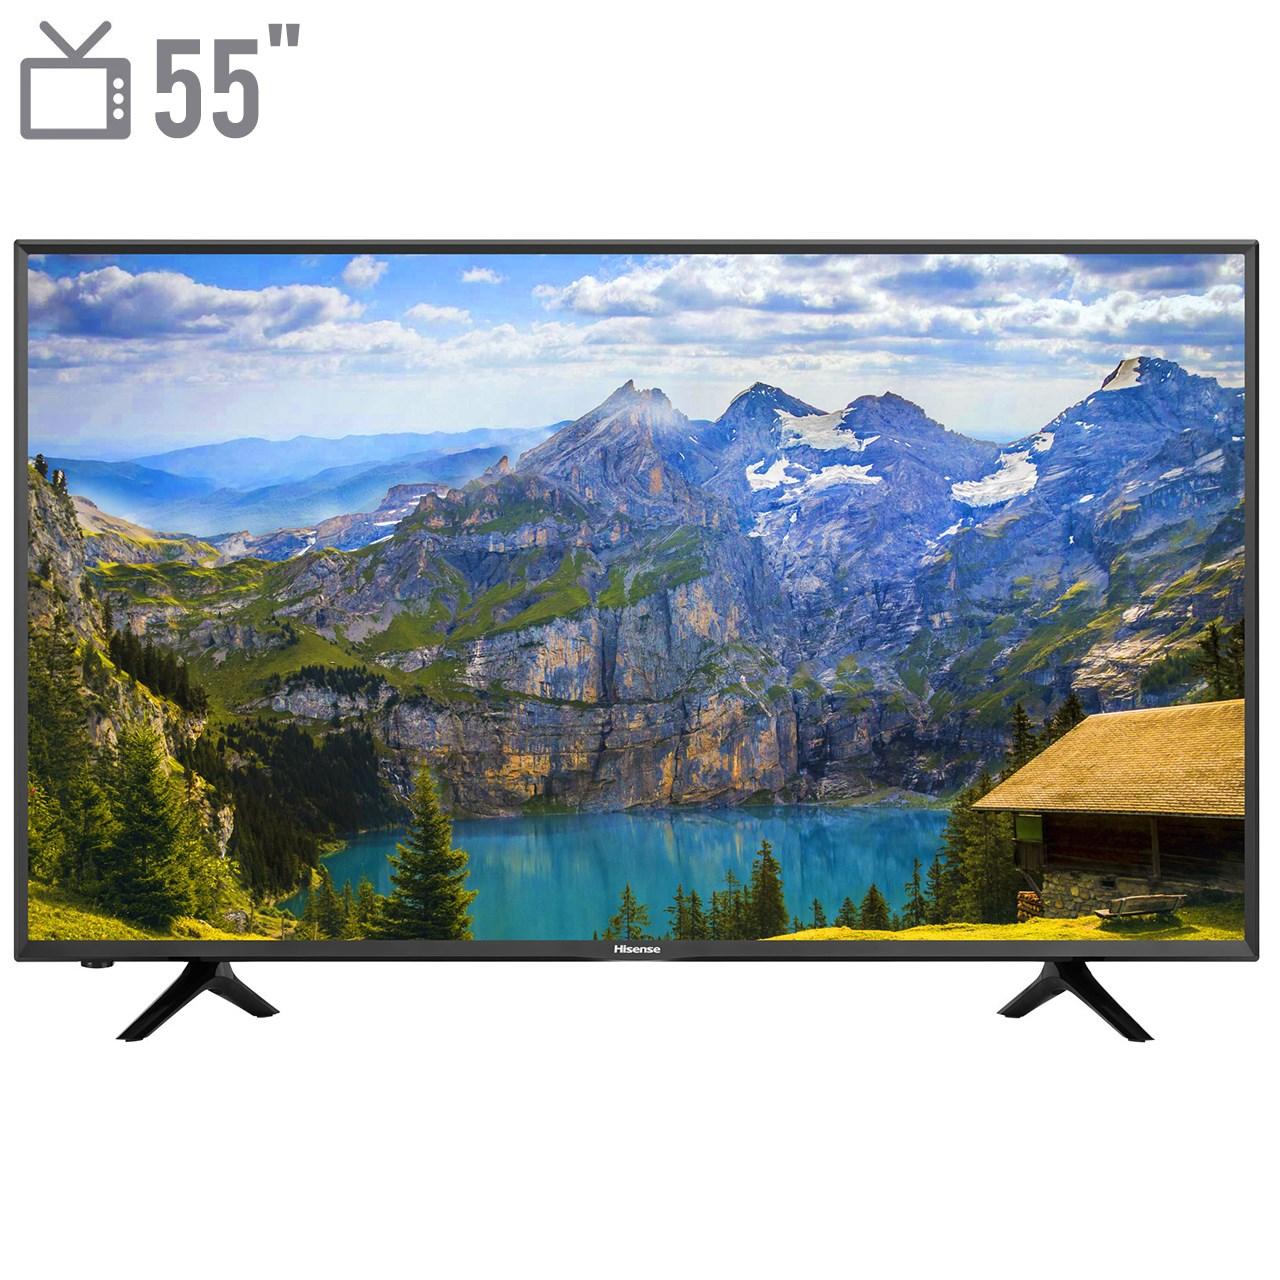 تلویزیون ال ای دی هوشمند هایسنس مدل 55N3000 سایز 55 اینچ